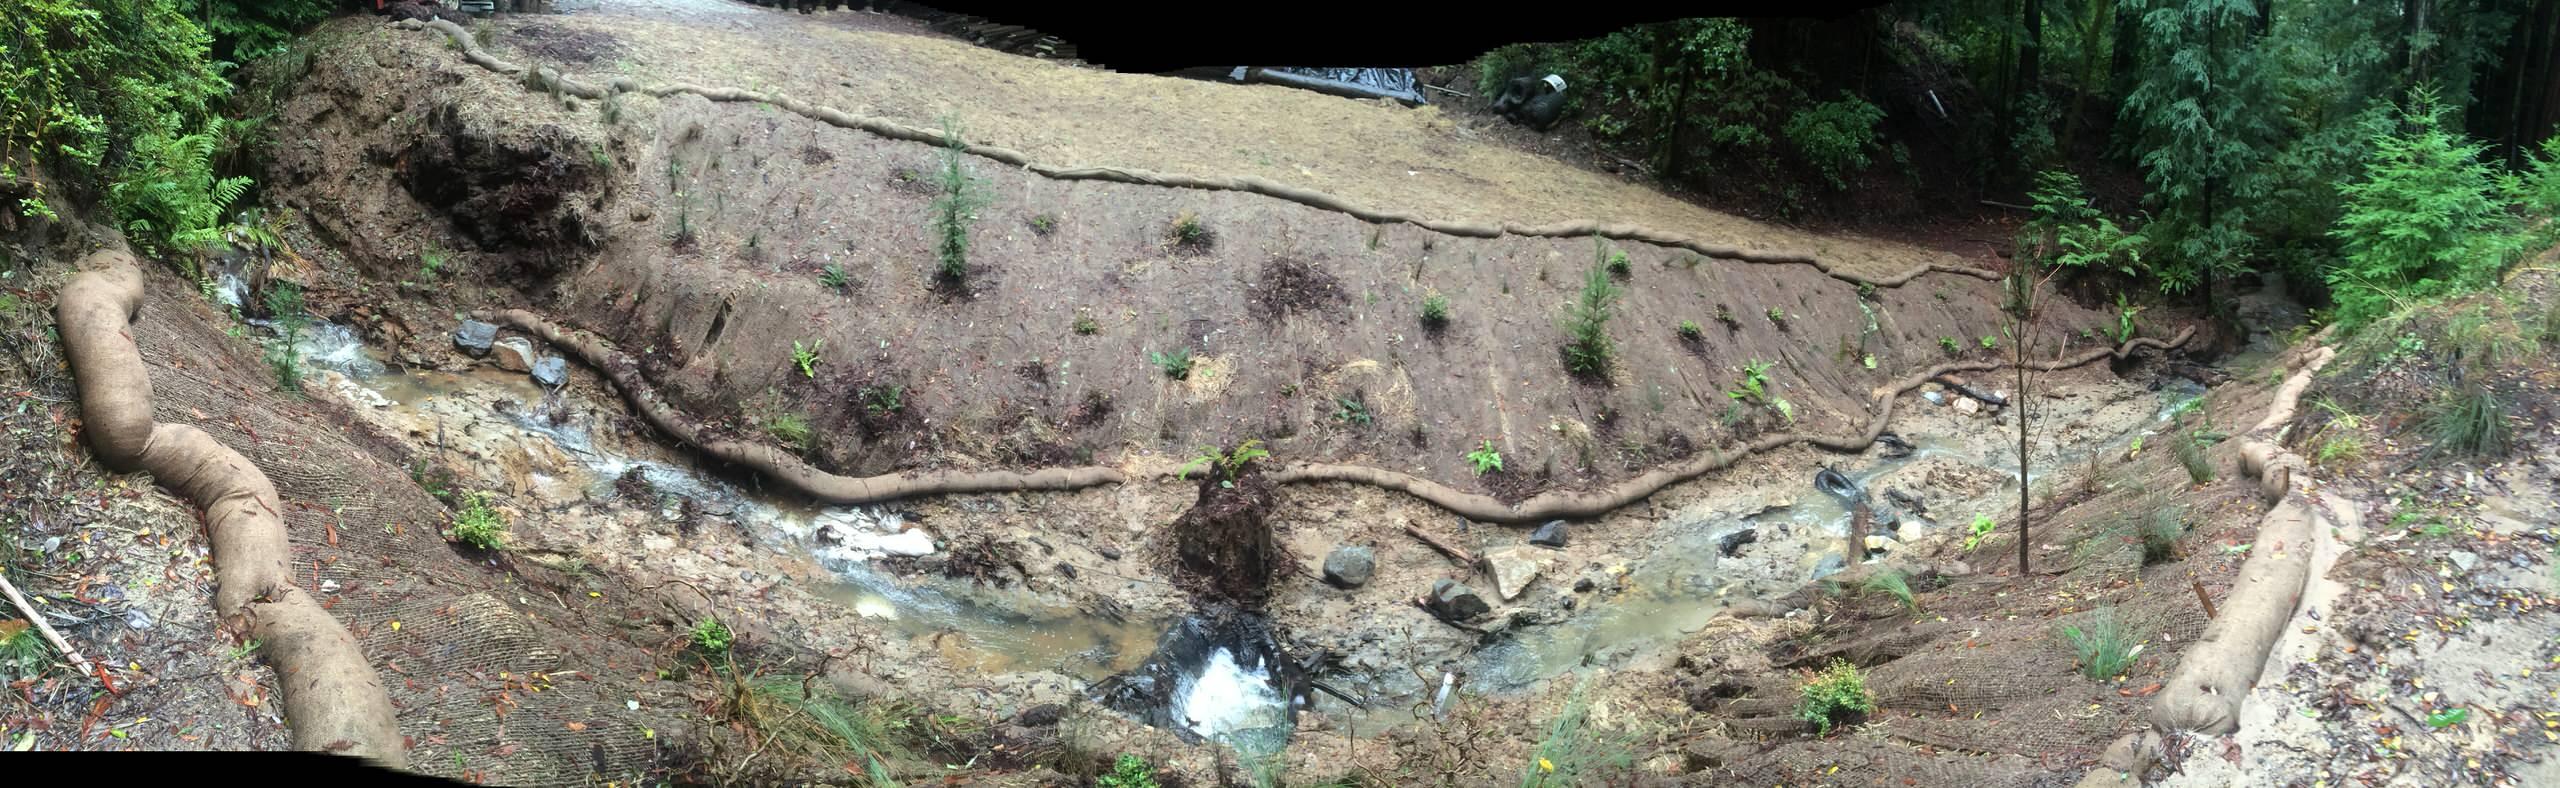 Camp Hammer Creek Restoration